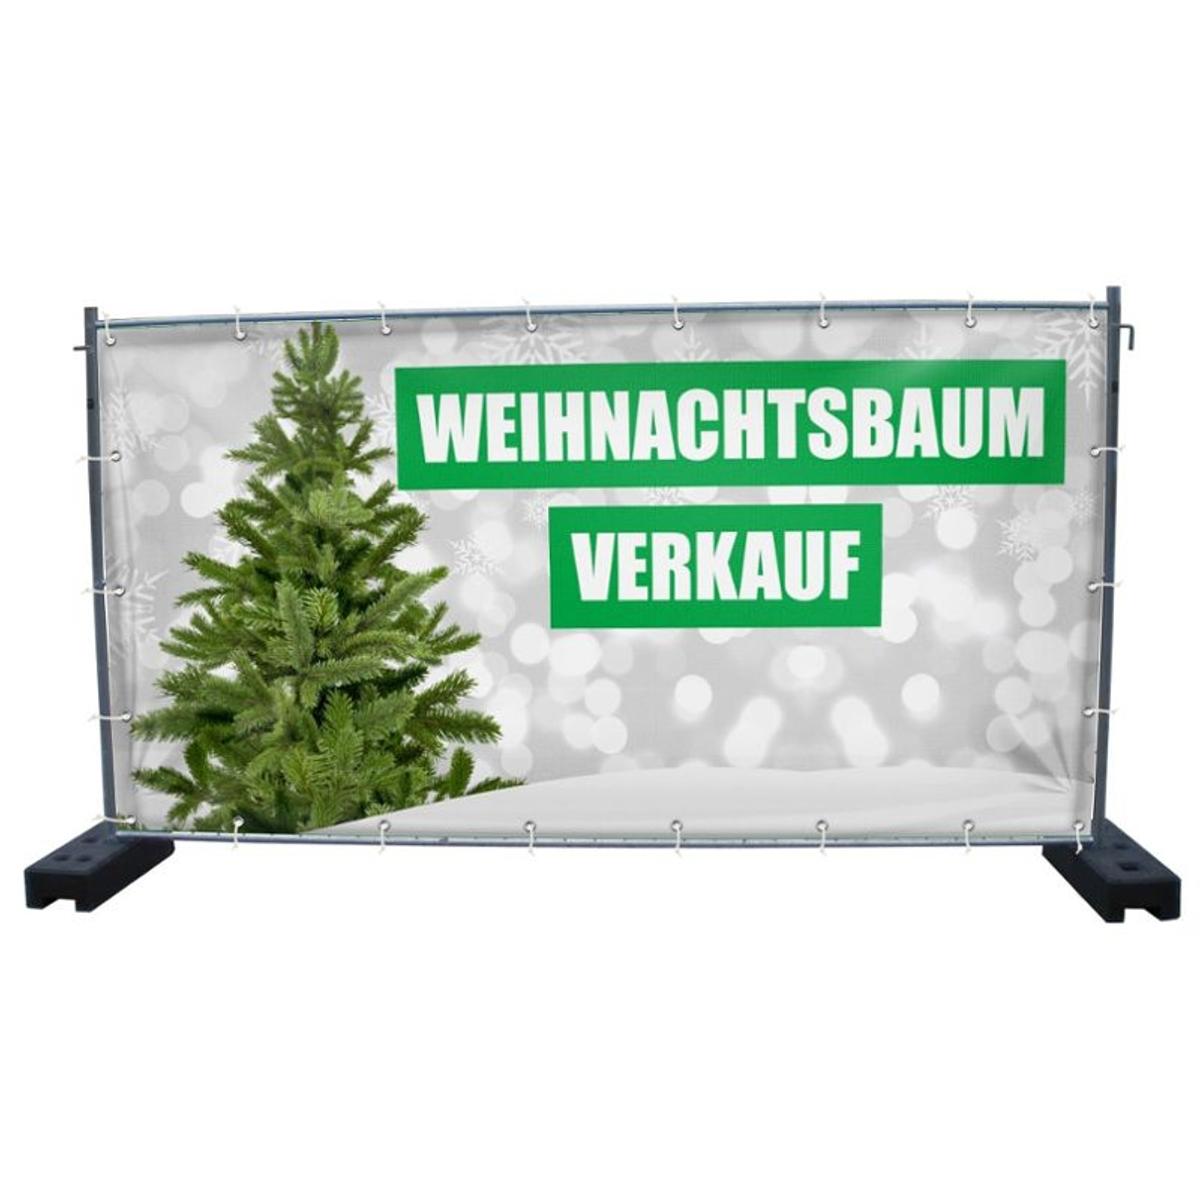 340 x 173 cmWeihnachtsbaumverkauf Bauzaunbanner PVC V6 Motiv